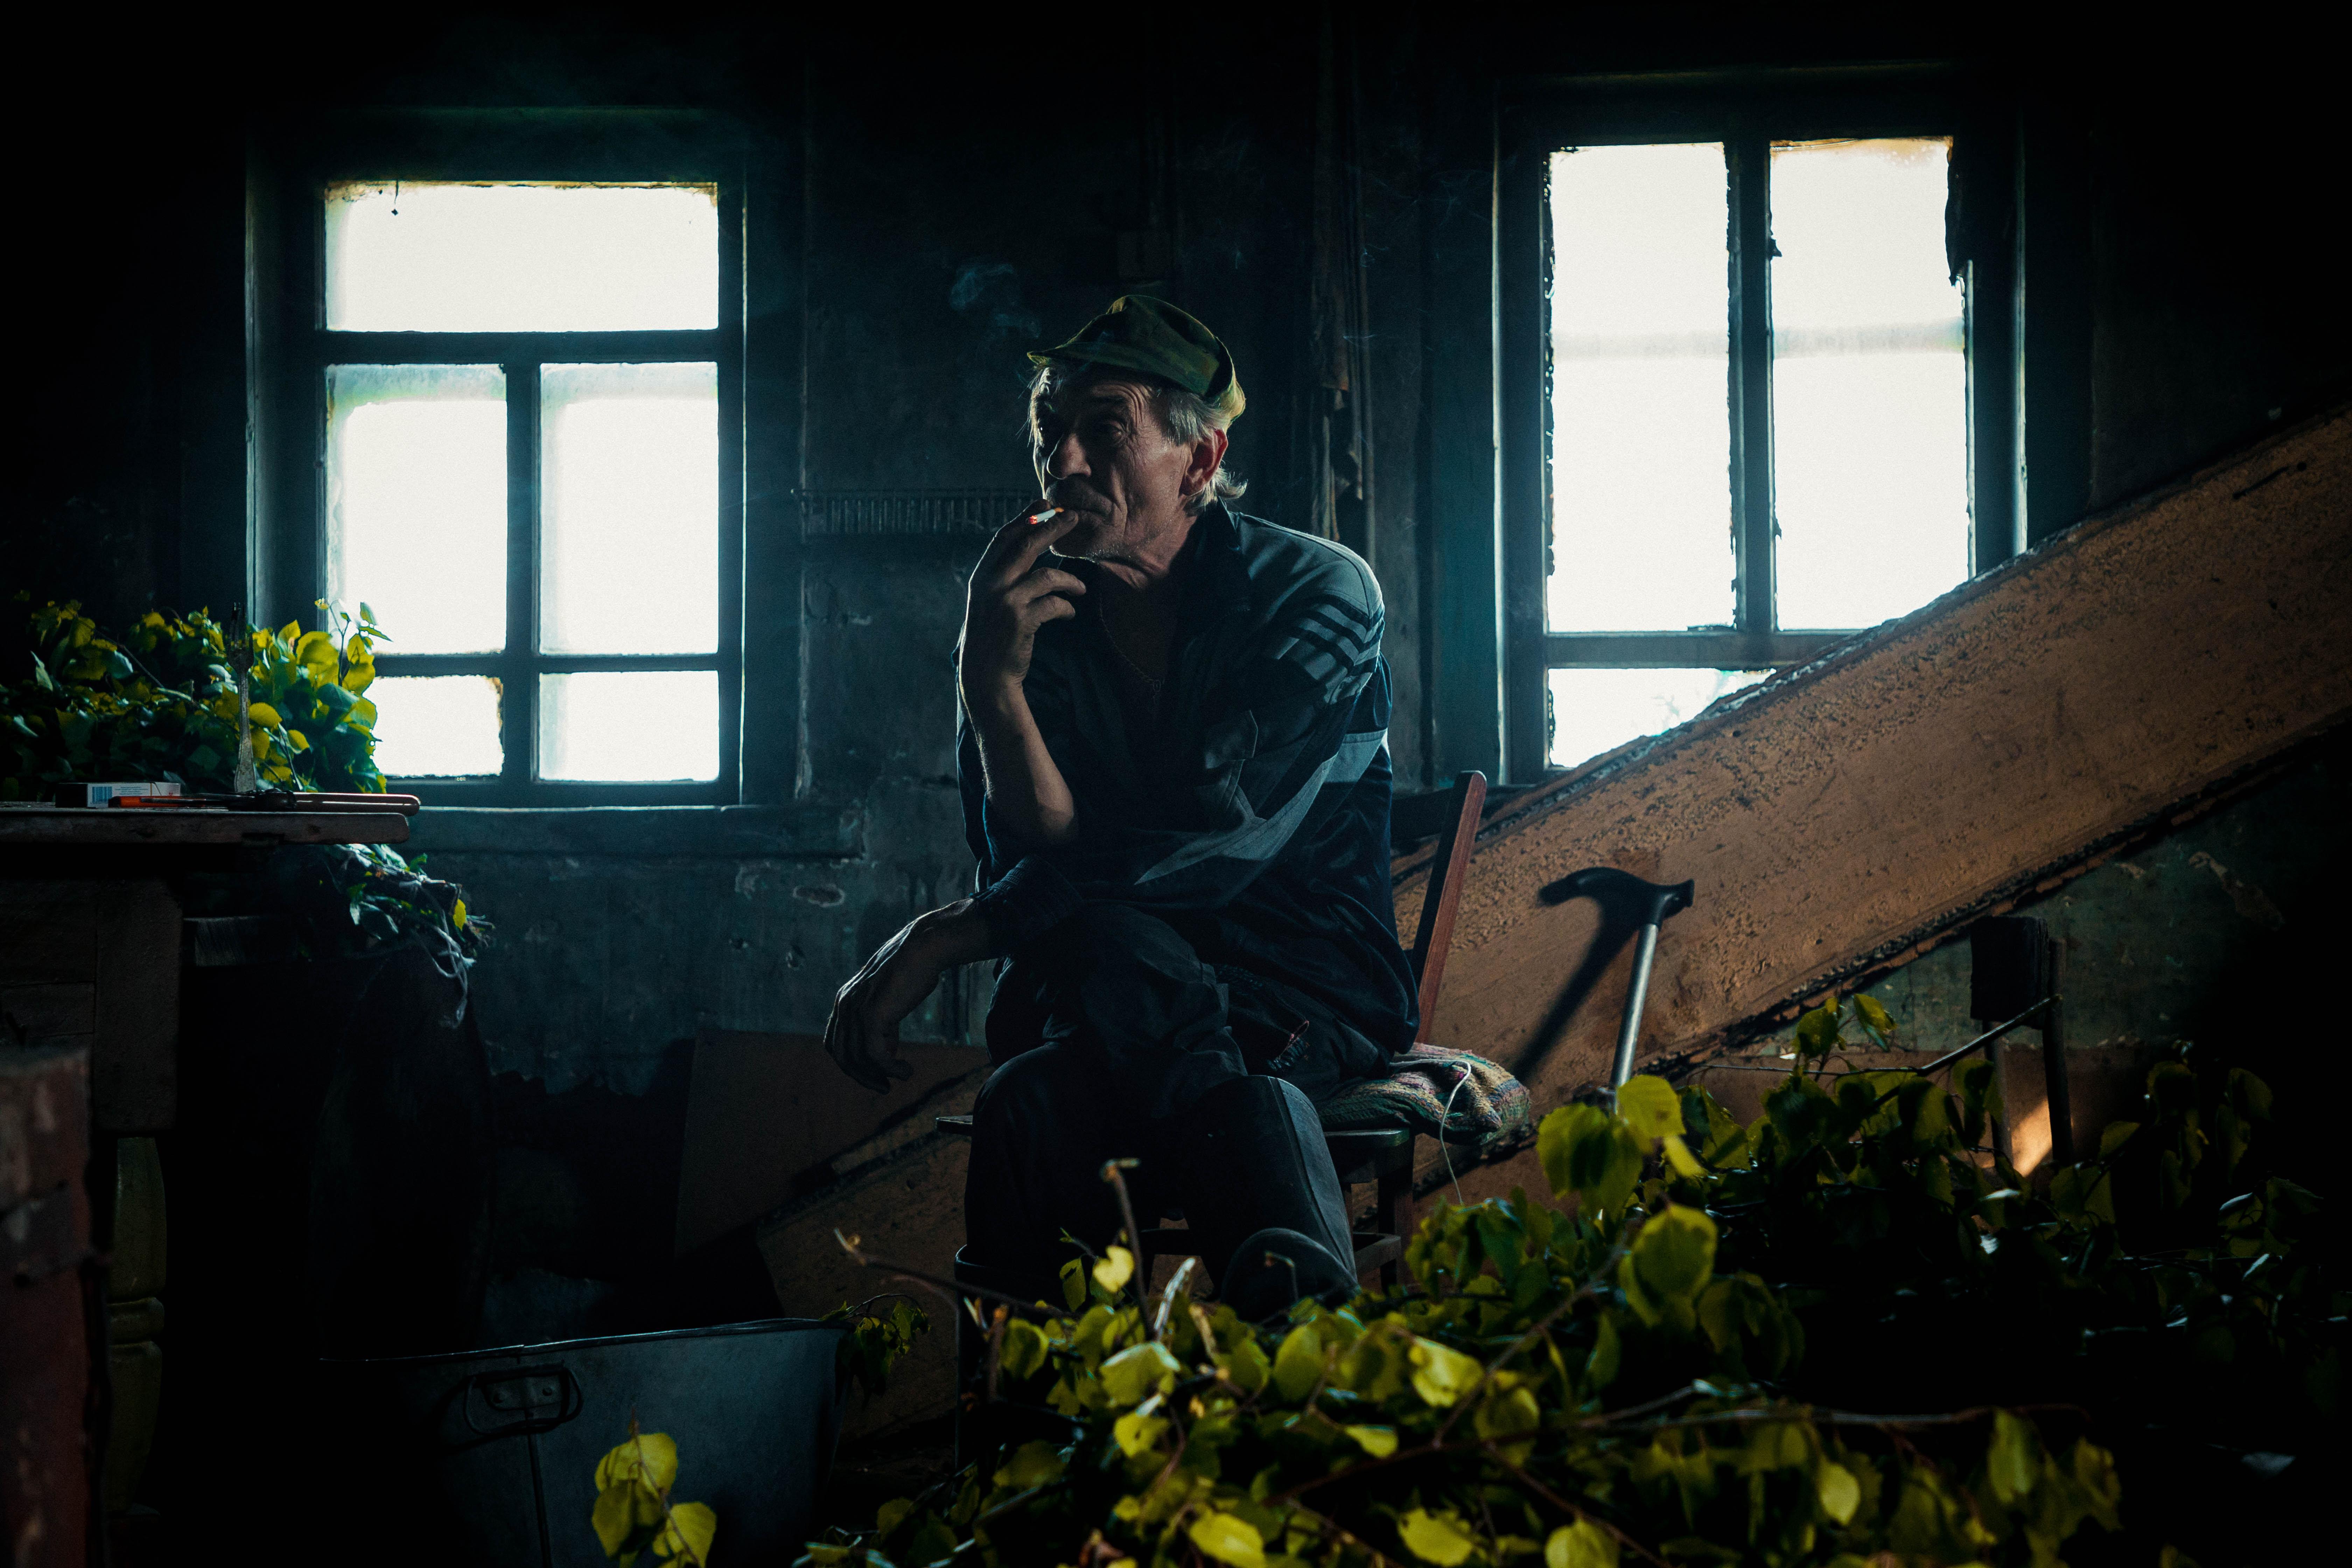 Older man sitting by the window in a dimly lit room smoking a cigarette in Knyazeva, Russia.